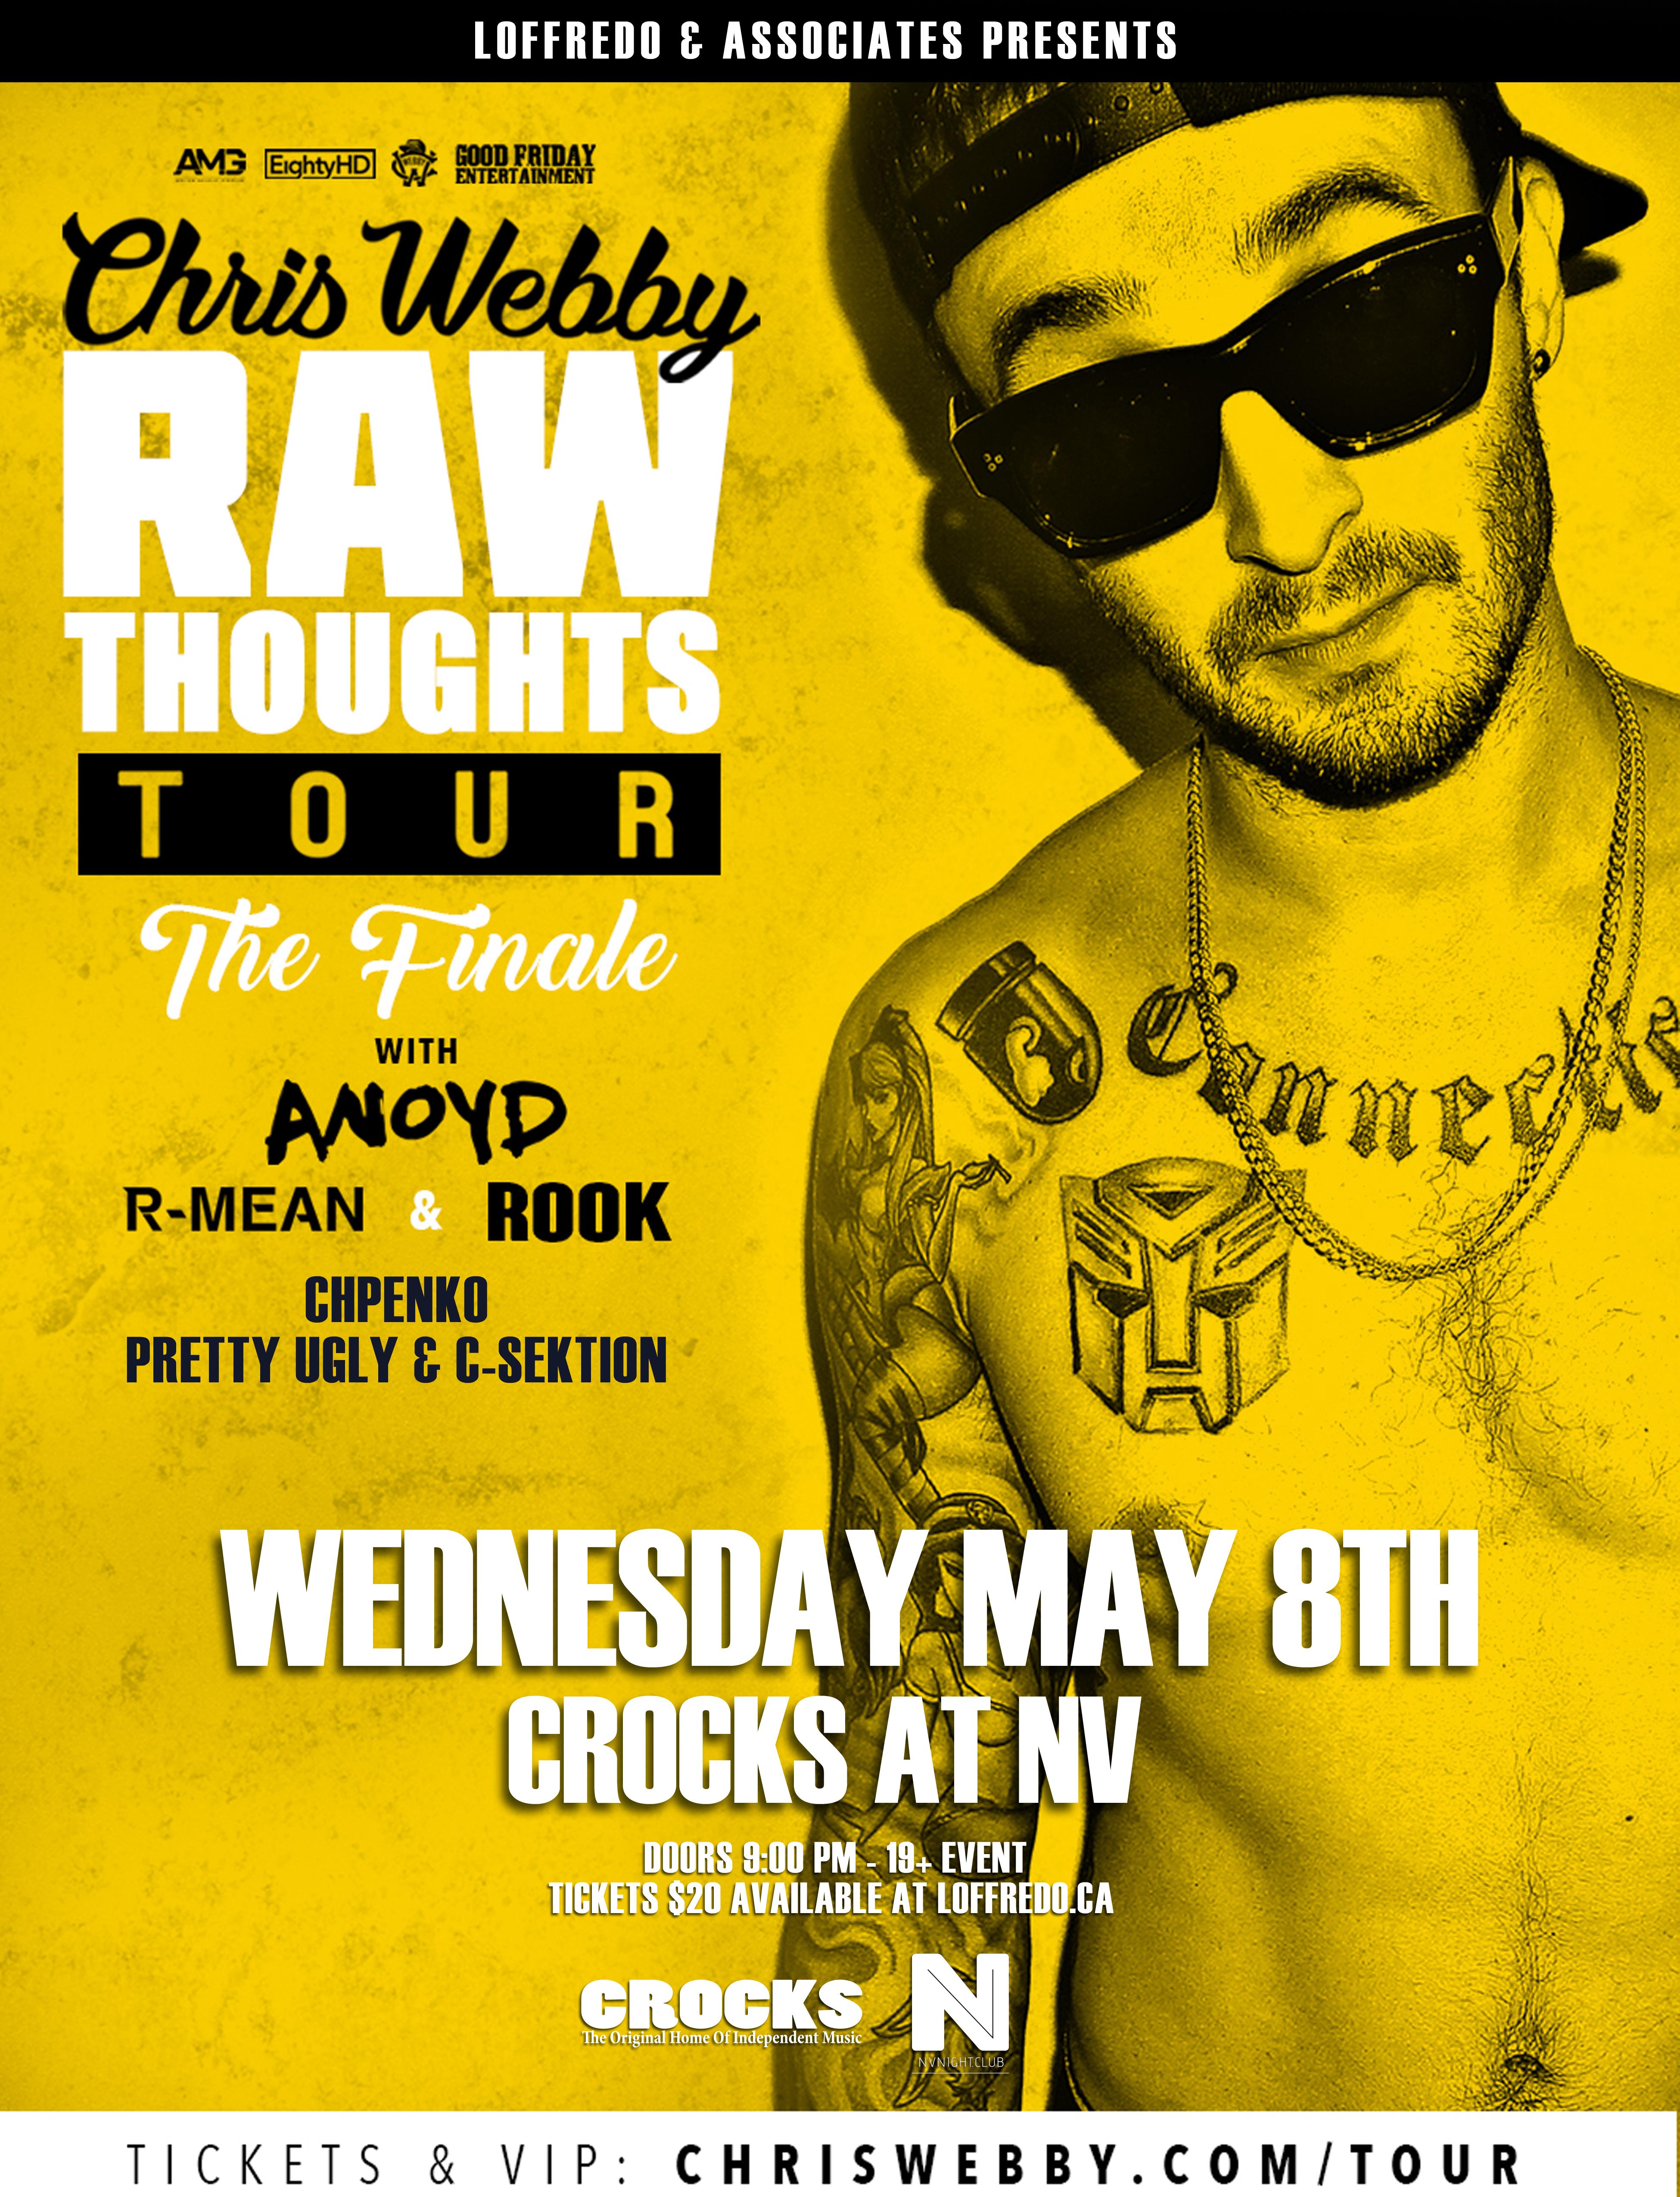 ALL ACCESS Pass Package: Chris Webby - May 8th - Crocks at NV 00293